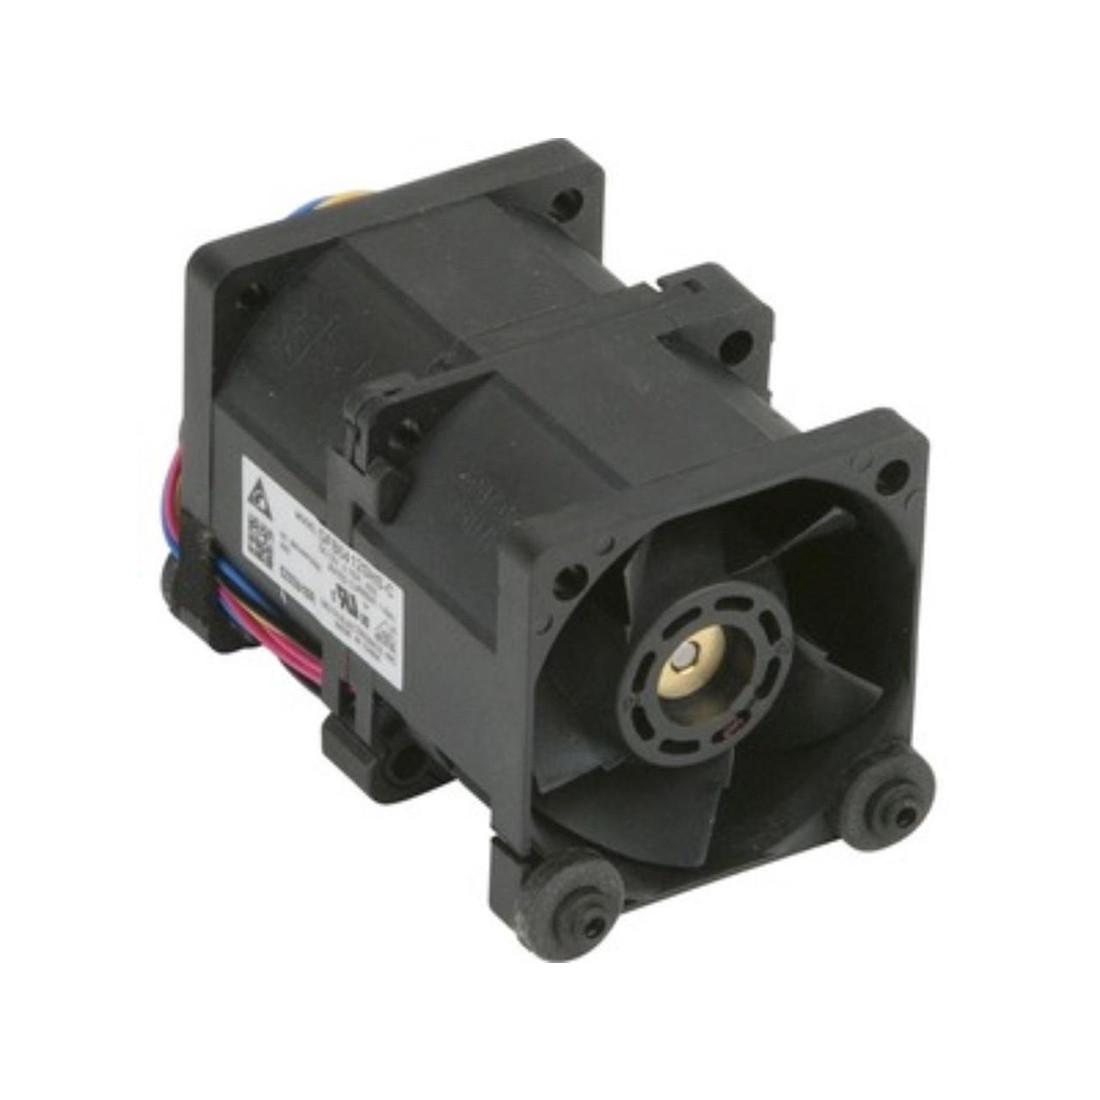 Вентилятор серверный Supermicro FAN-0156L4